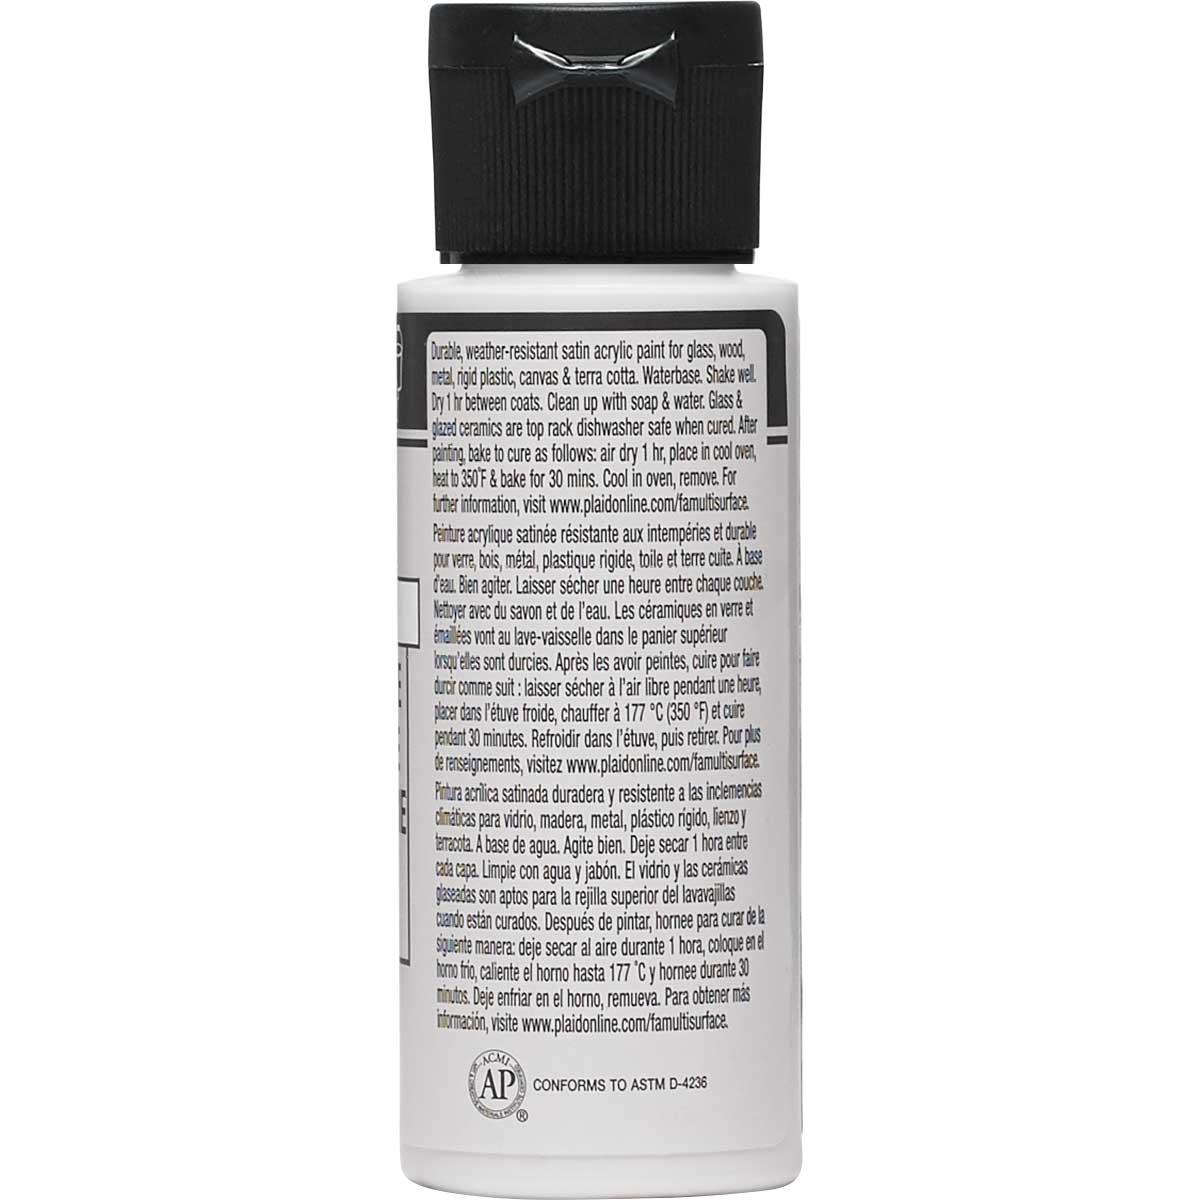 FolkArt ® Multi-Surface Satin Acrylic Paints - Dove, 2 oz. - 2382